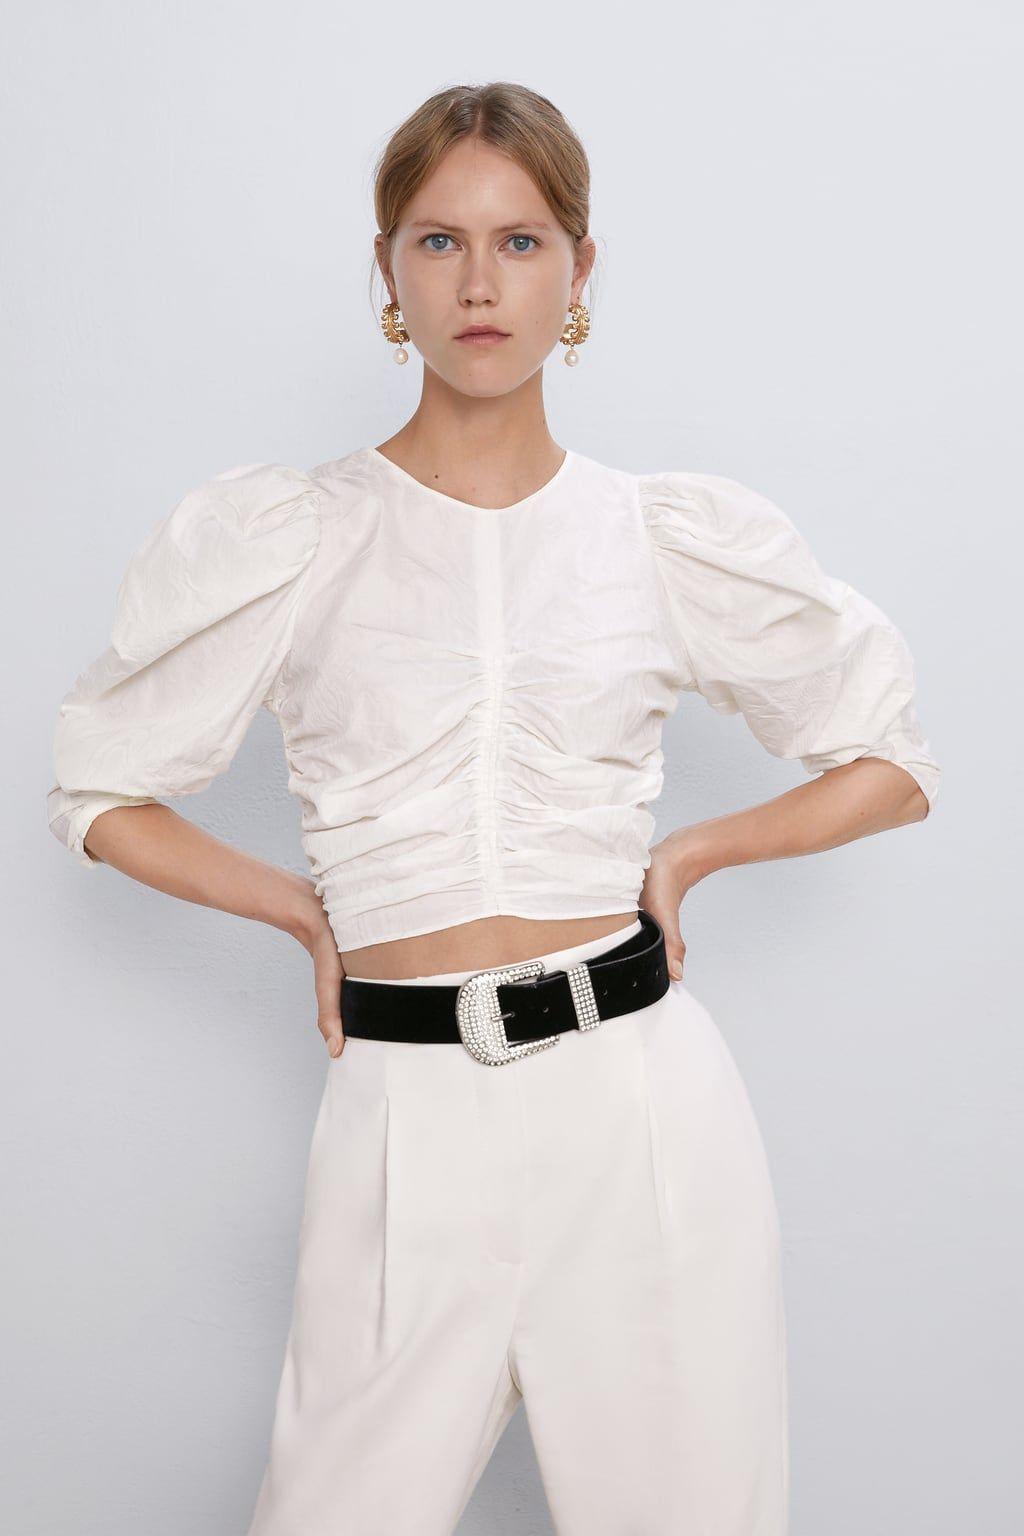 UK Womens Puff Sleeve High Neck Casual OL Shirt Ladies Autumn Crop Tops Blouse